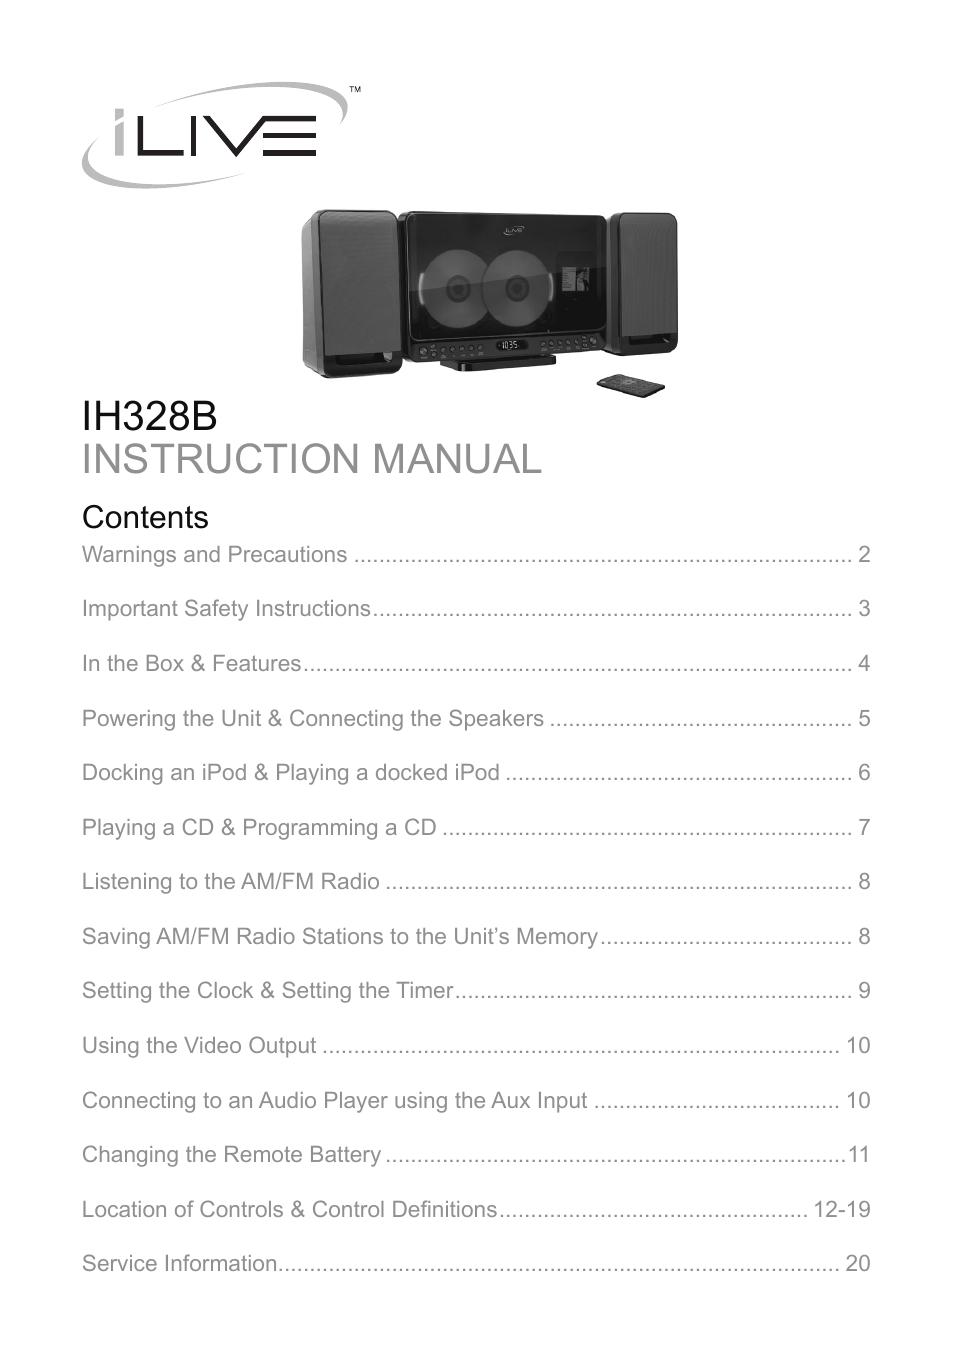 ilive user manual free owners manual u2022 rh wordworksbysea com Instruction Manual Example Instruction Manual Example